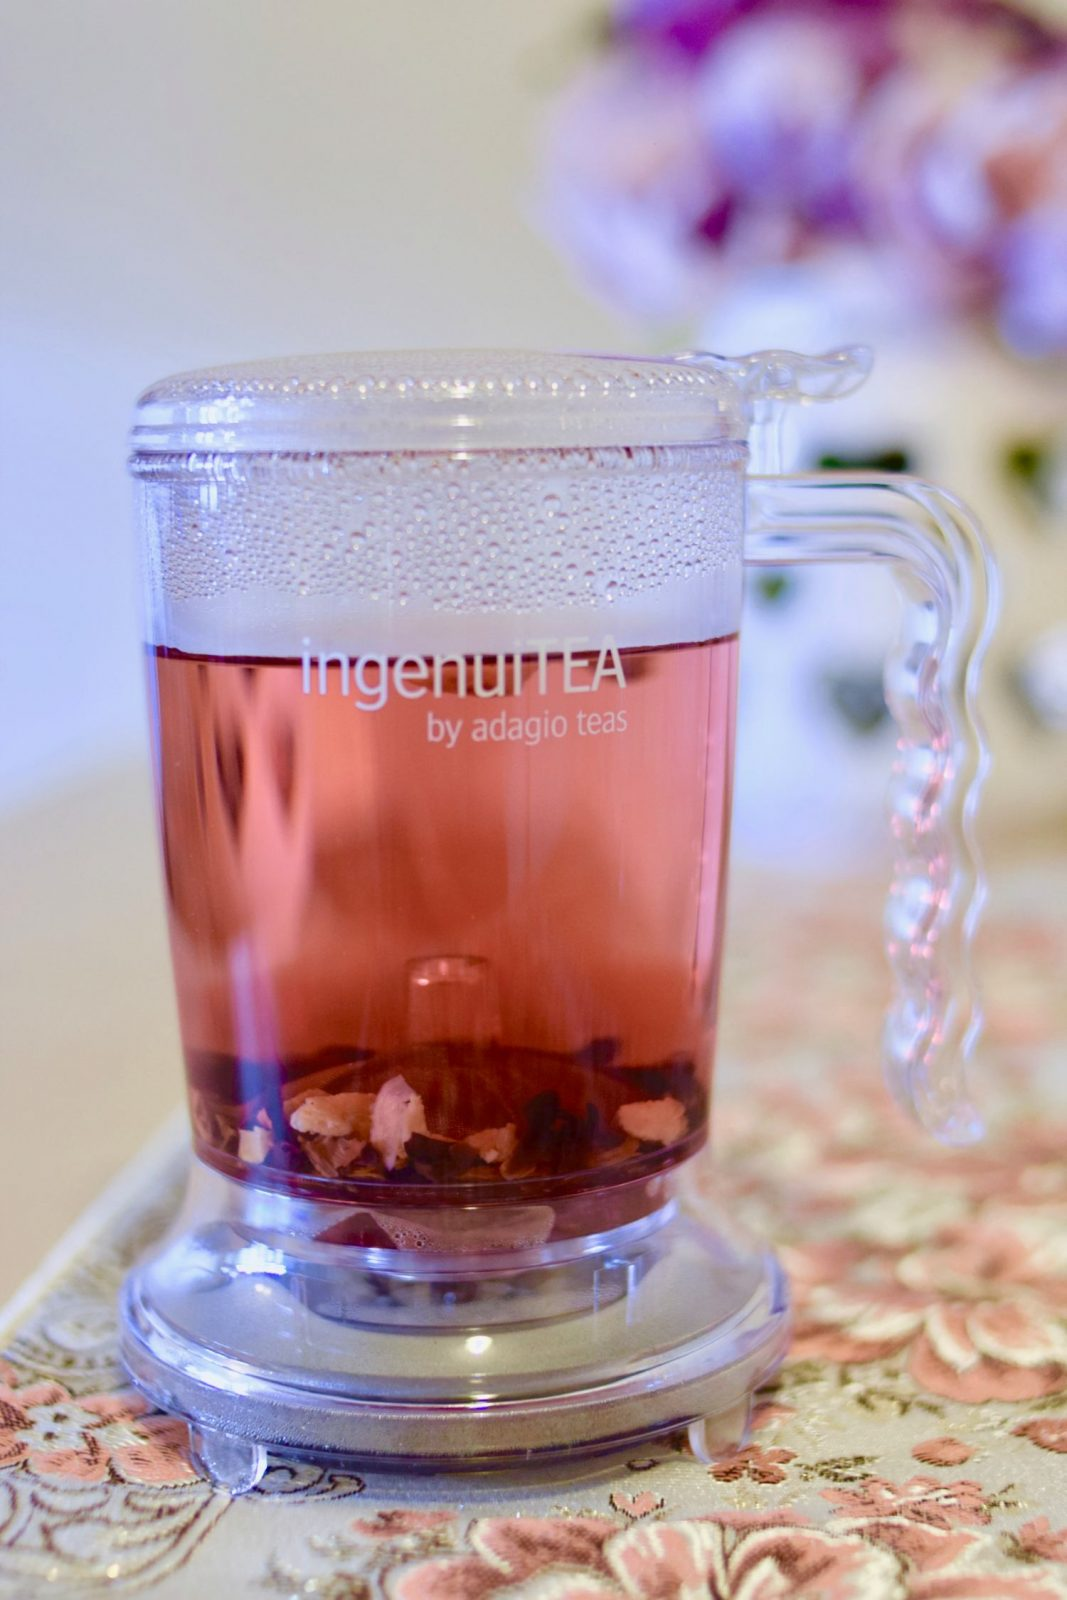 Adagio loose leaf teas brewing in Ingenuitea pot